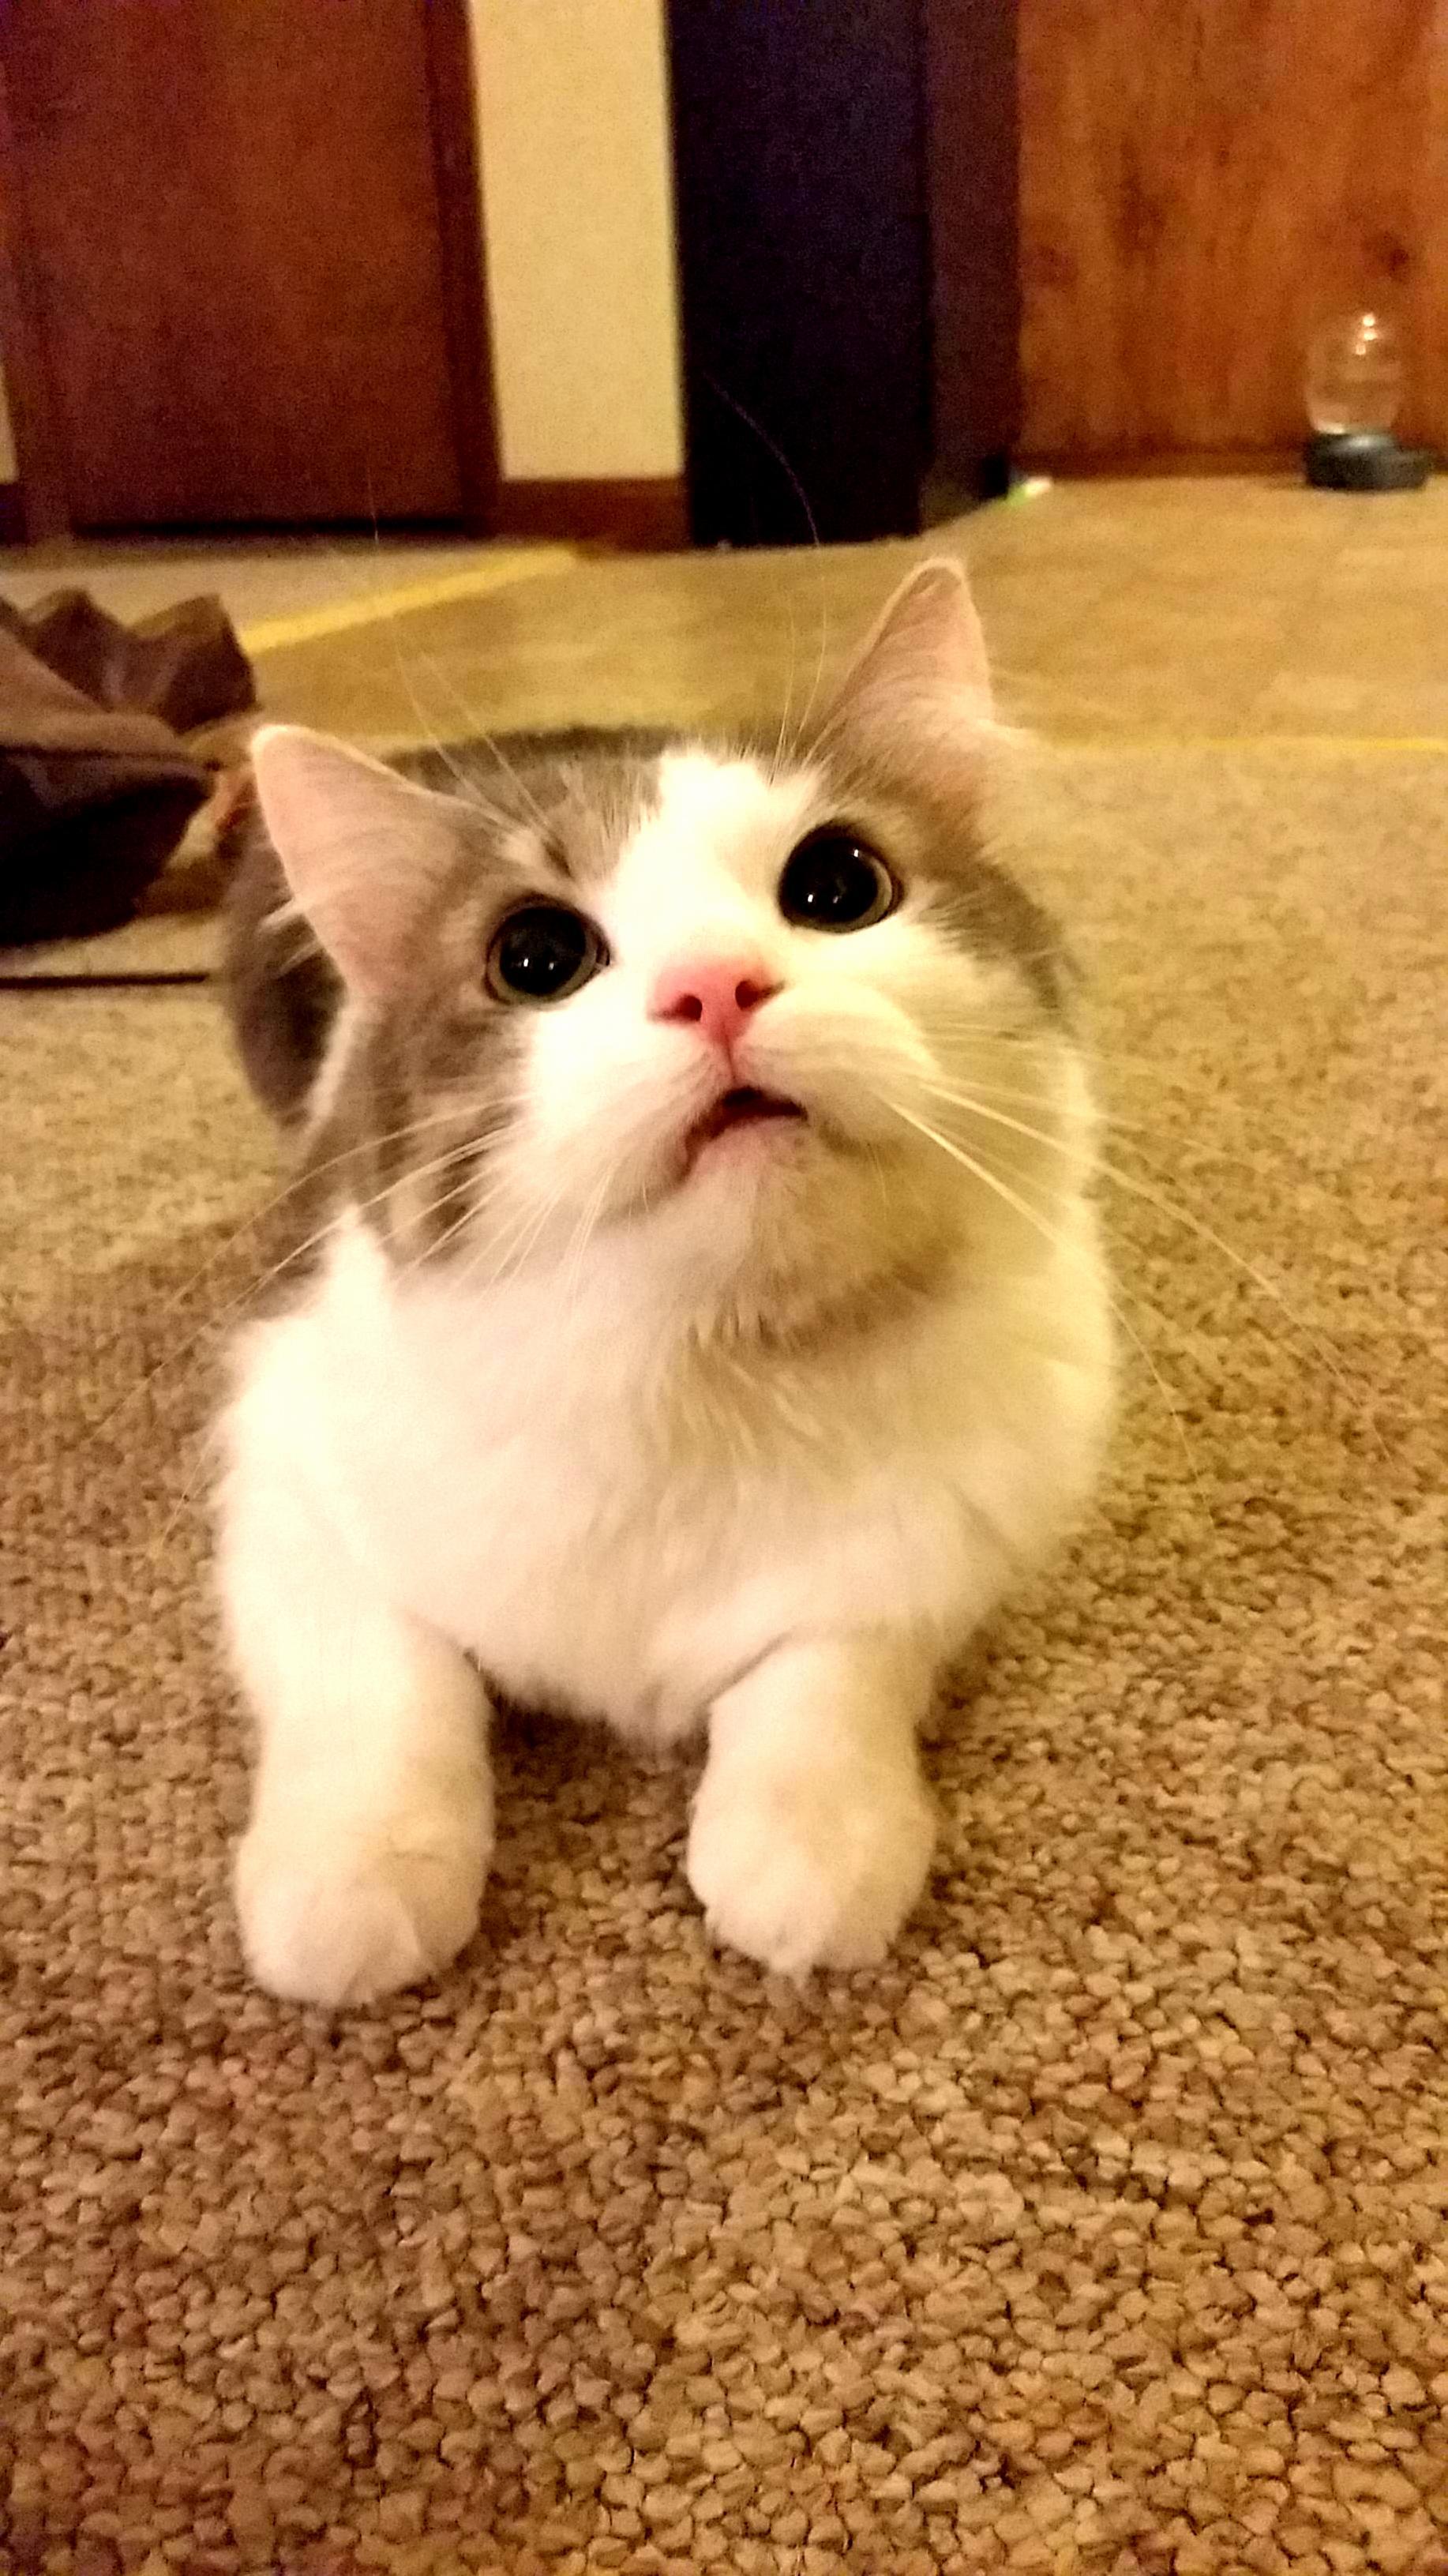 Adorable murderous eyes